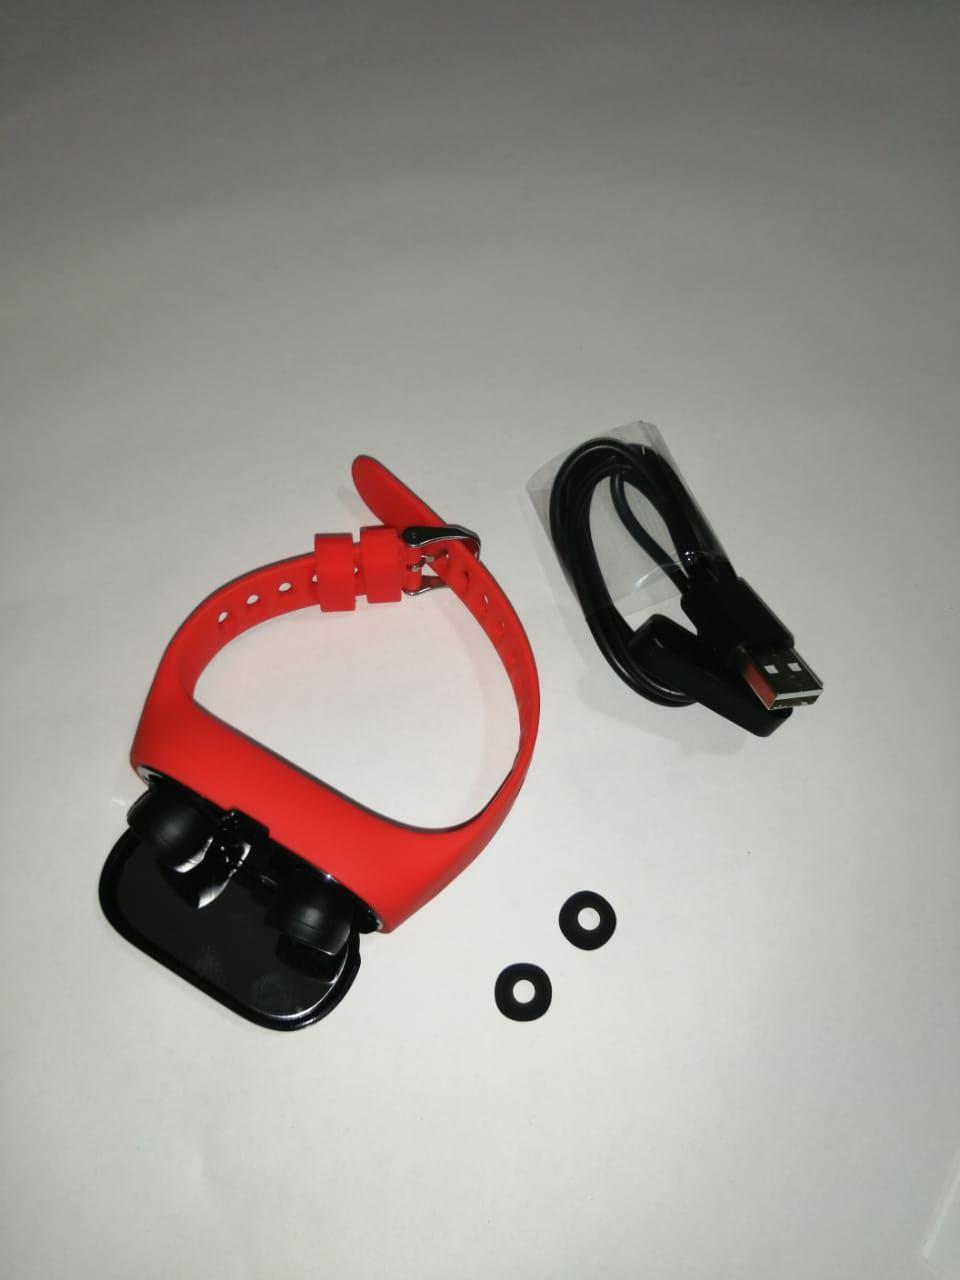 M1 Smart Watch 2 In 1 بسعر 950ج بدل من 1350 Baby Shoes Accessories Samsung Gear Fit